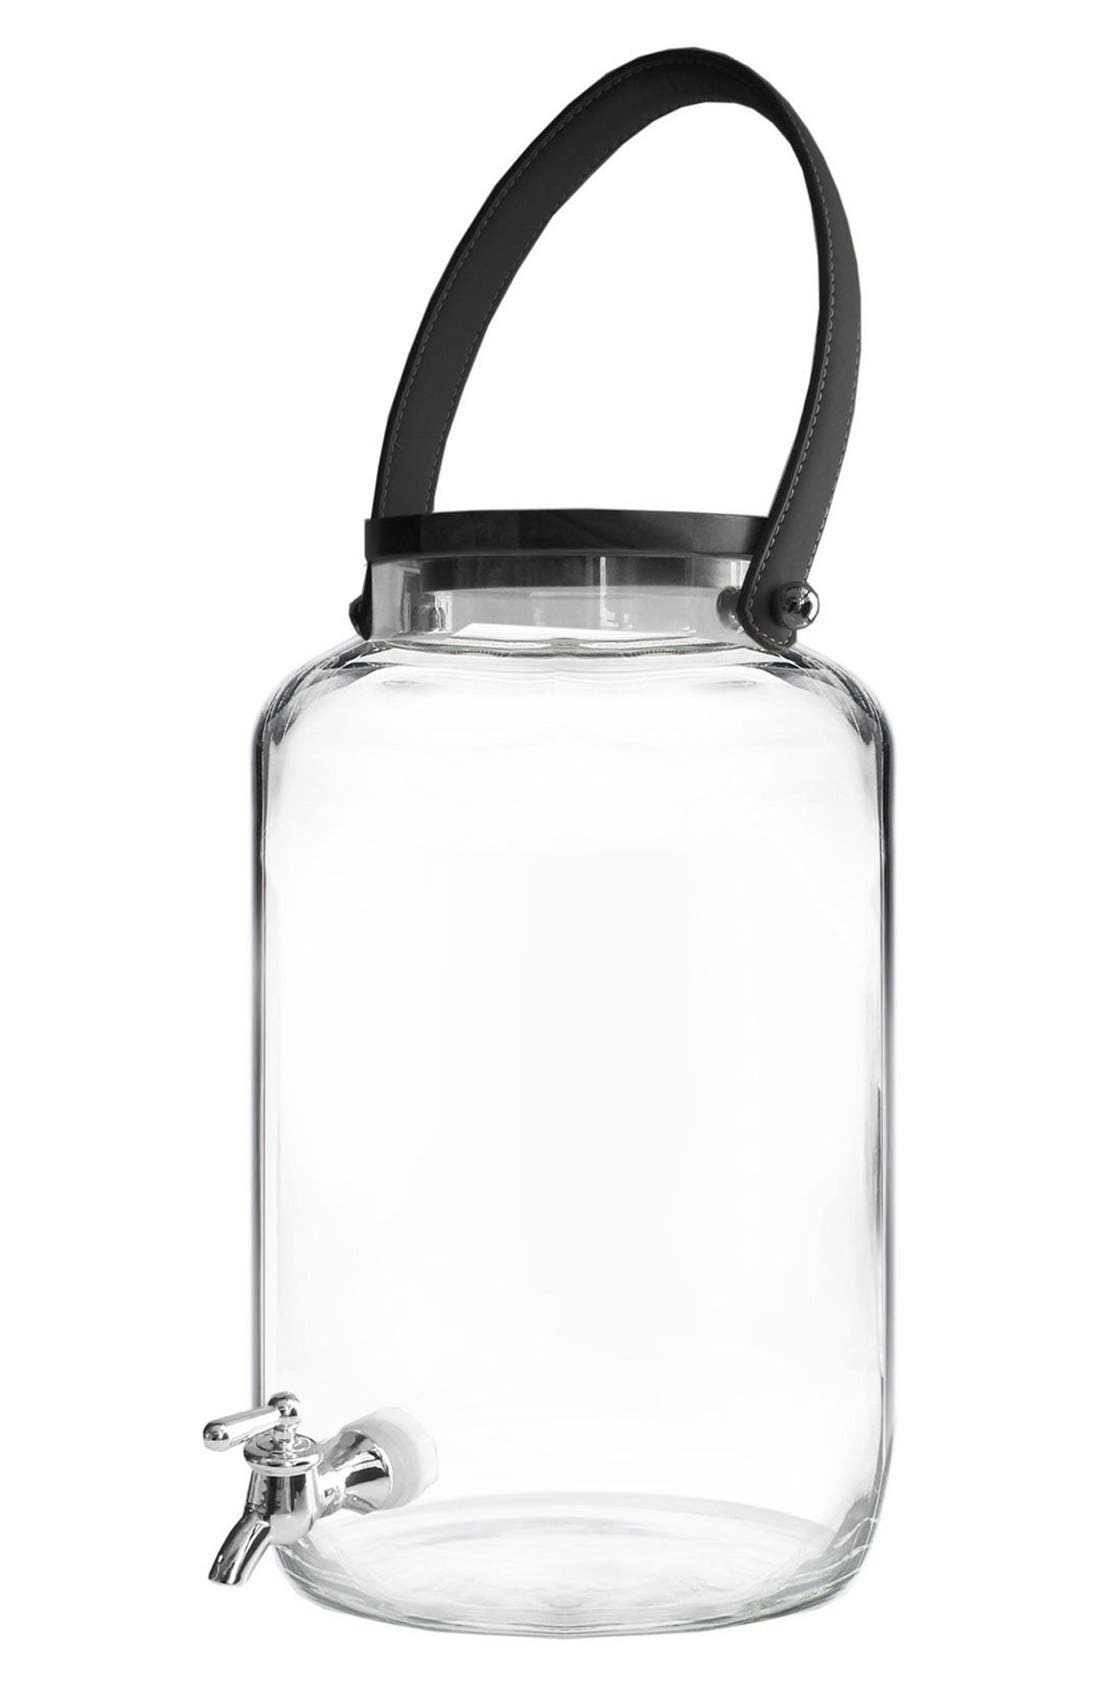 Kent 2-Gallon Beverage Dispenser,                             Main thumbnail 1, color,                             100